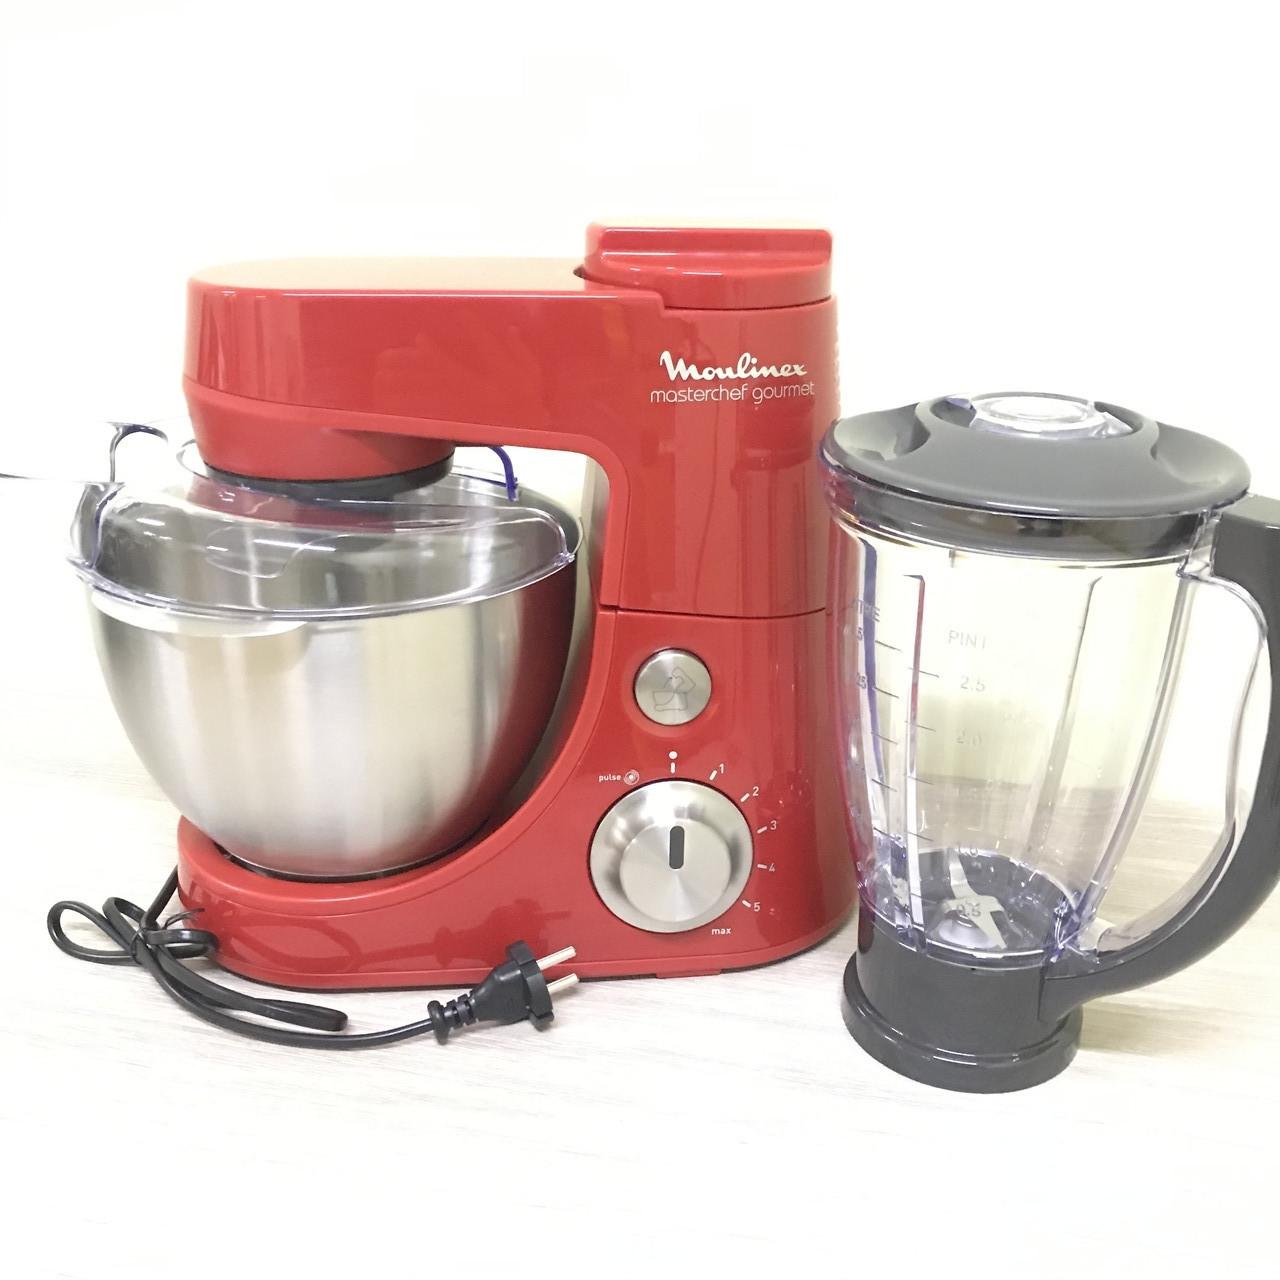 Кухонный комбайн Moulinex Masterchef Gourmet Rouge мощность 900W, чаша 4L, блендер 1,5L